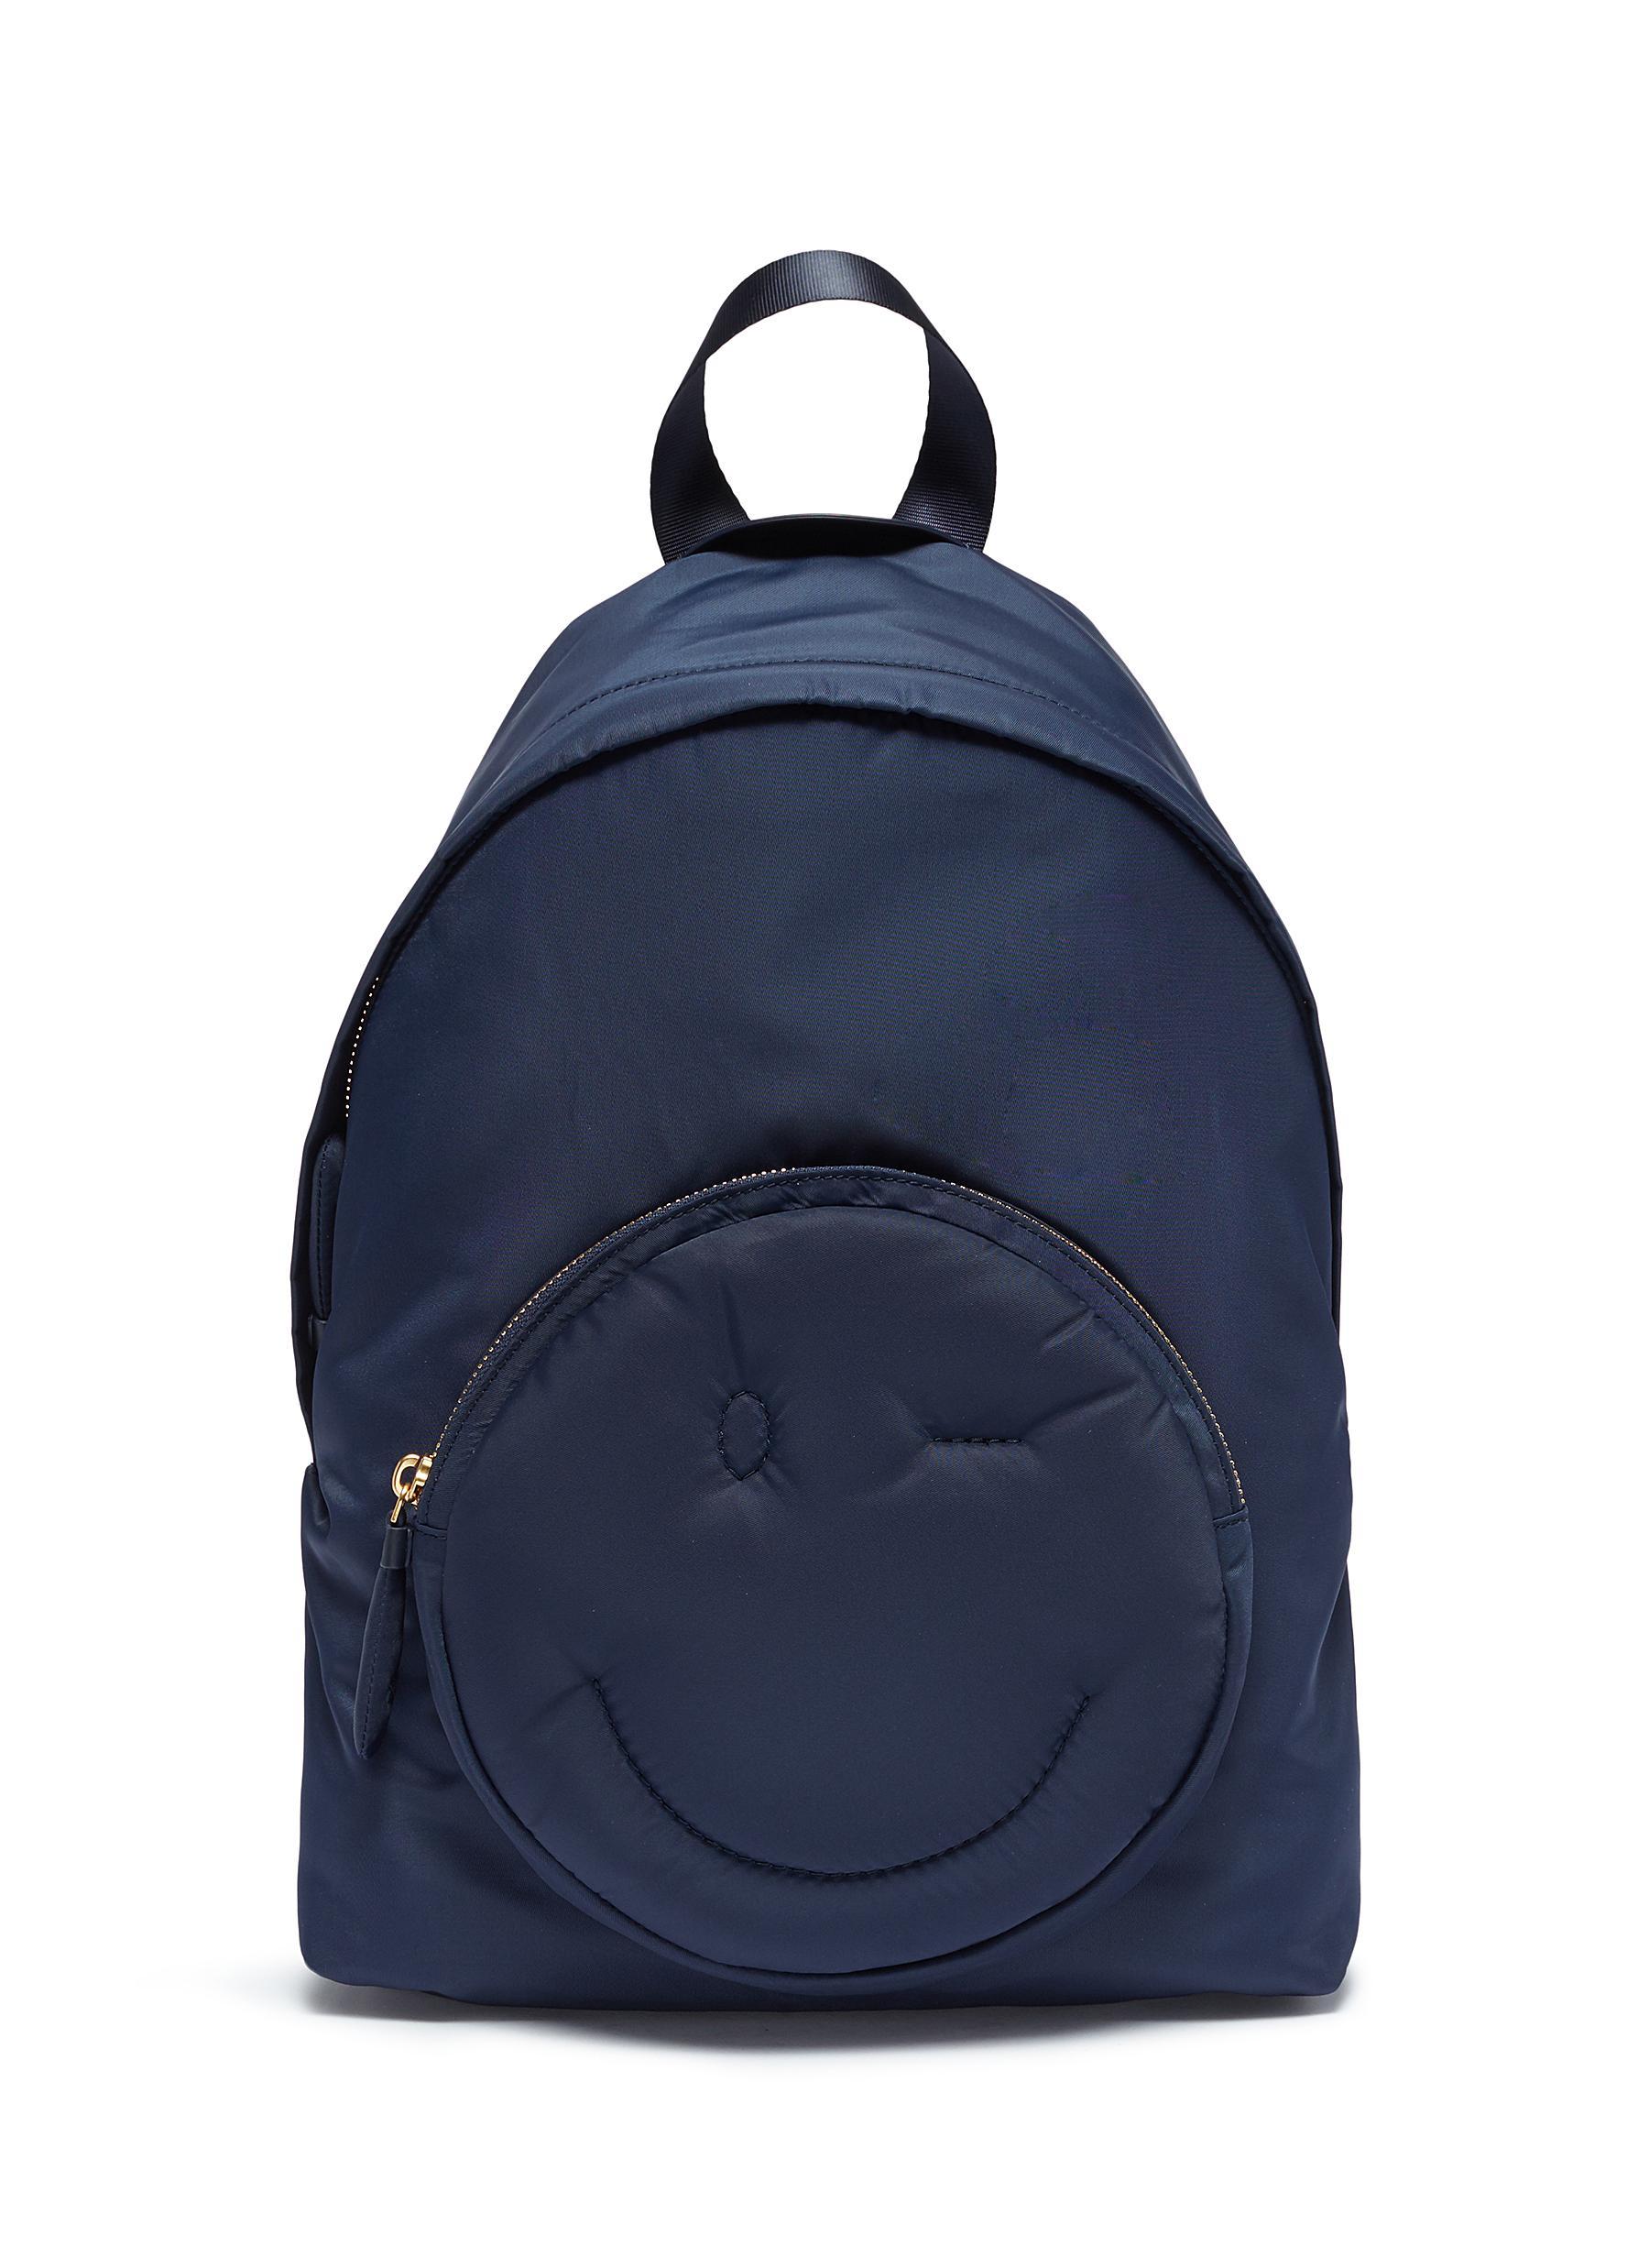 Chubby Wink nylon backpack Anya Hindmarch LDY6IJHQ